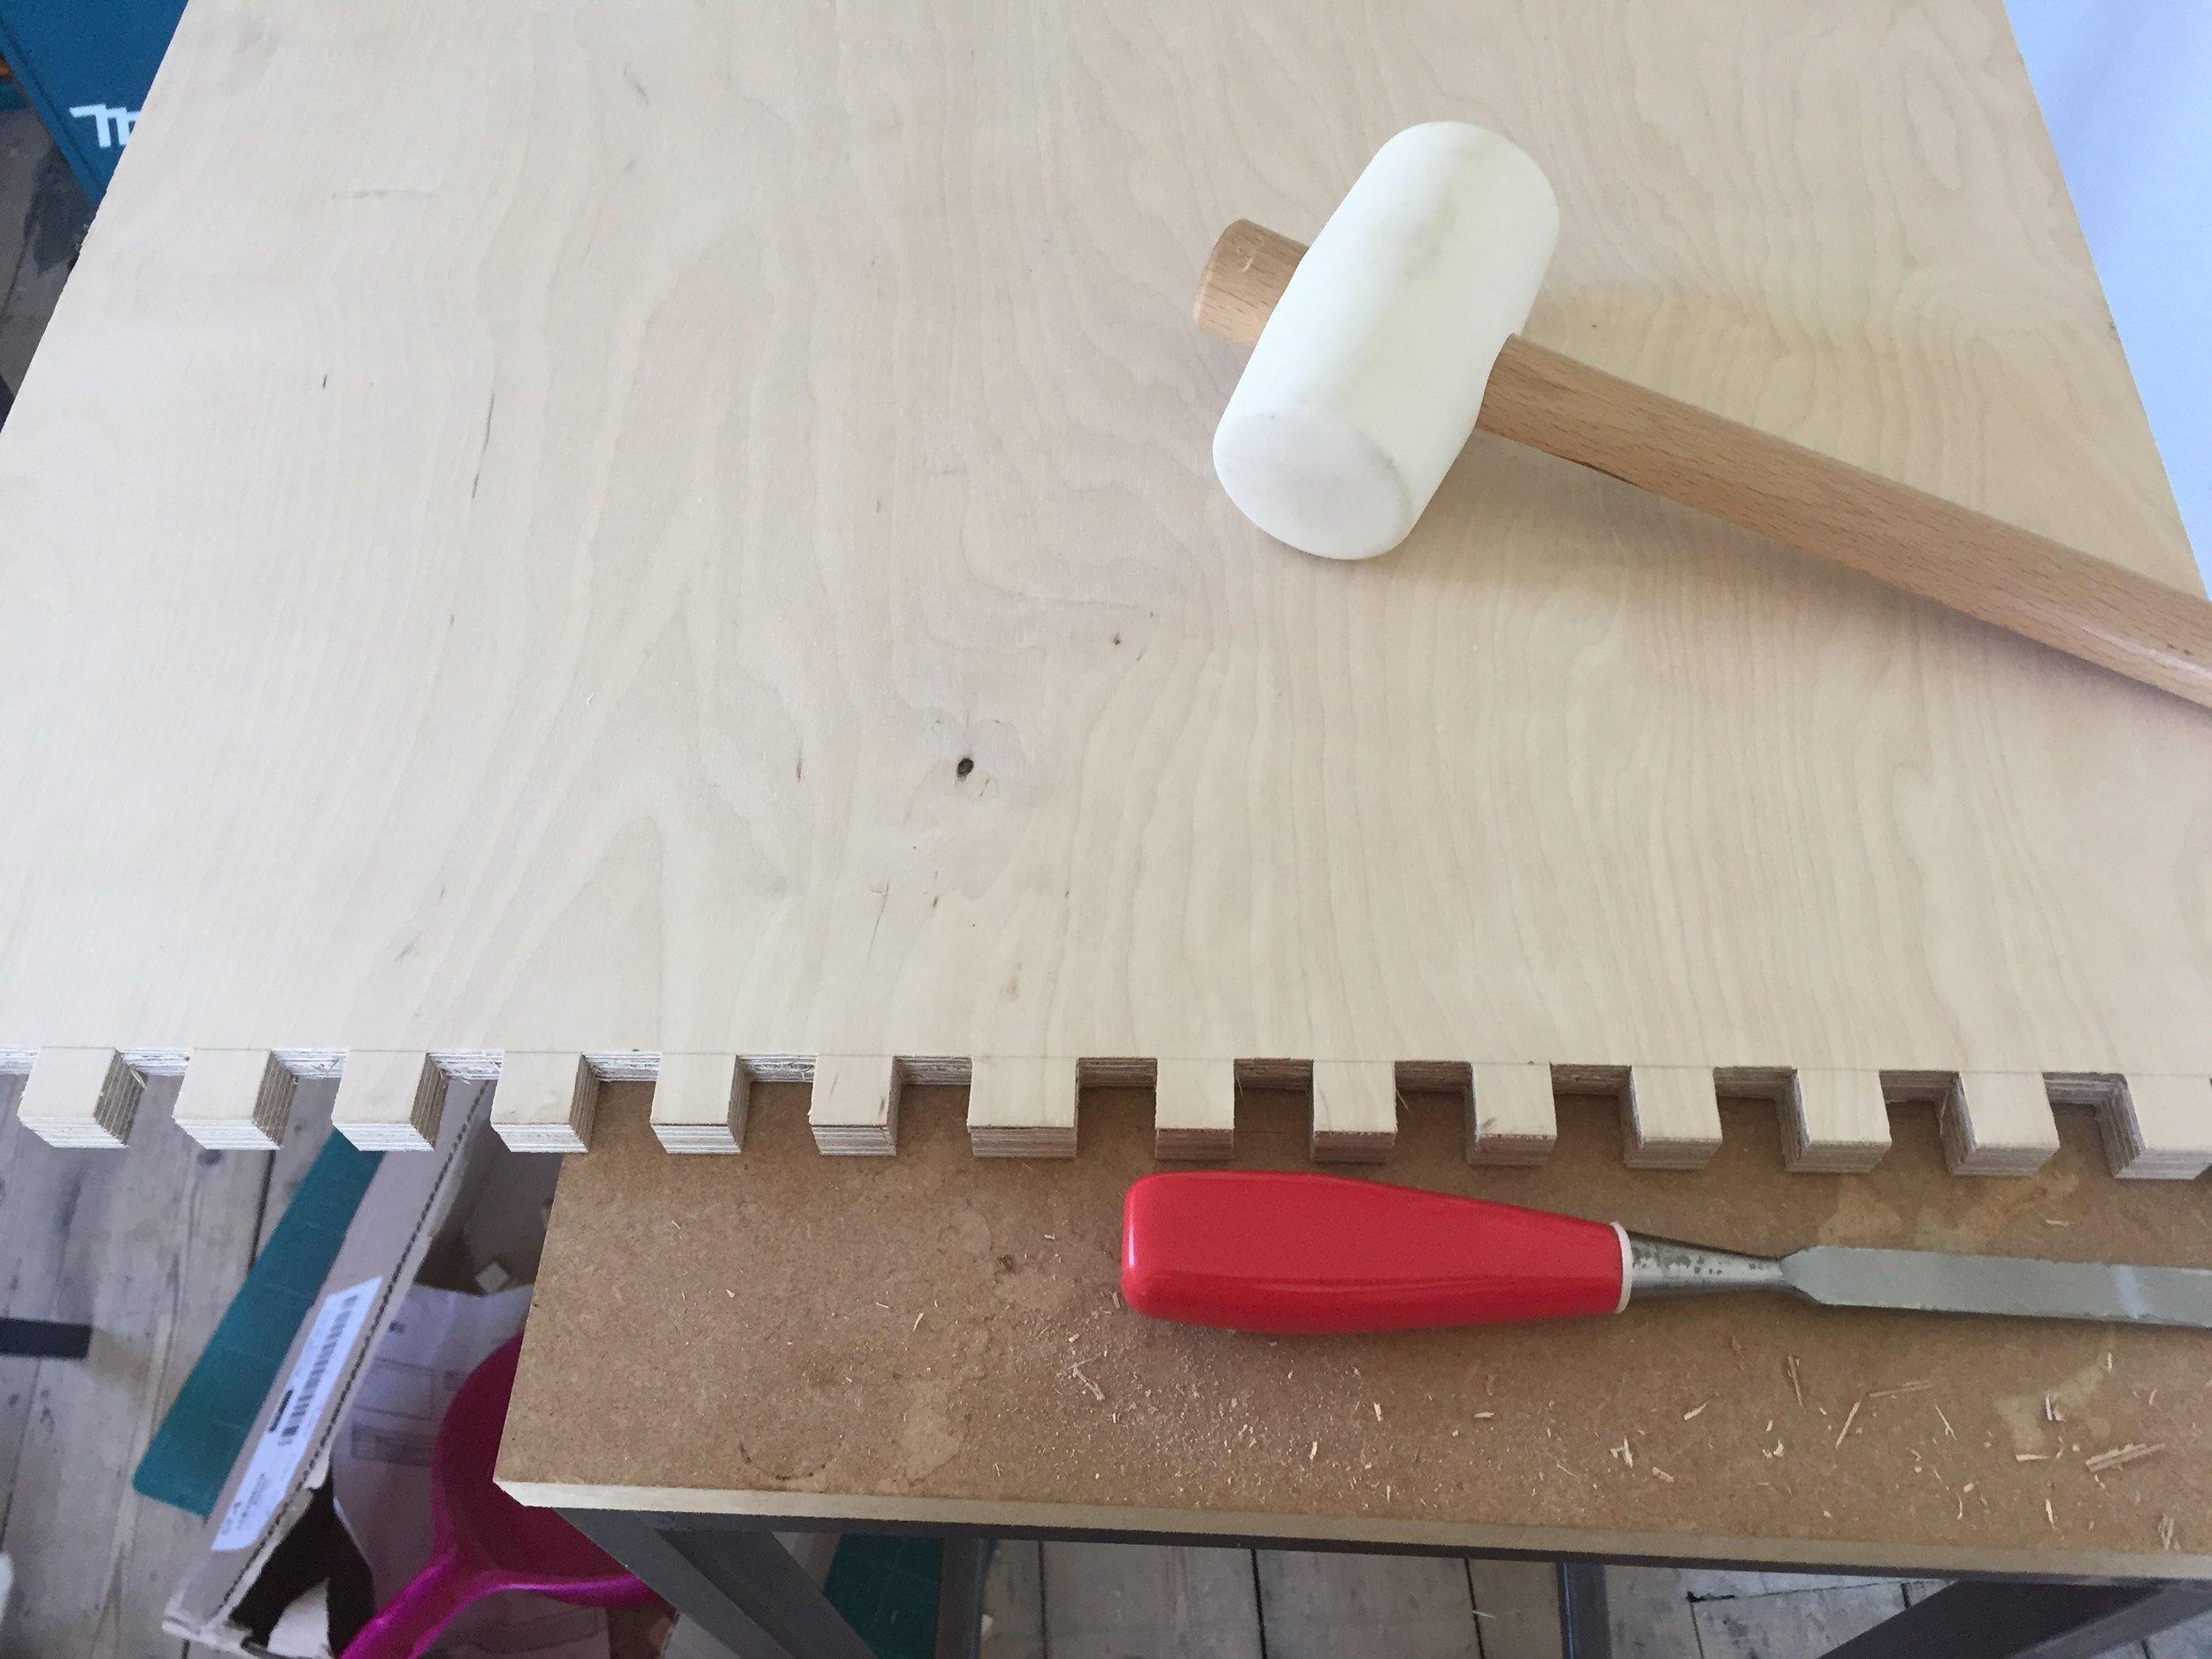 Desk   Birch Plywood & Furniture Linoleum. Box Joint & Dado joinery